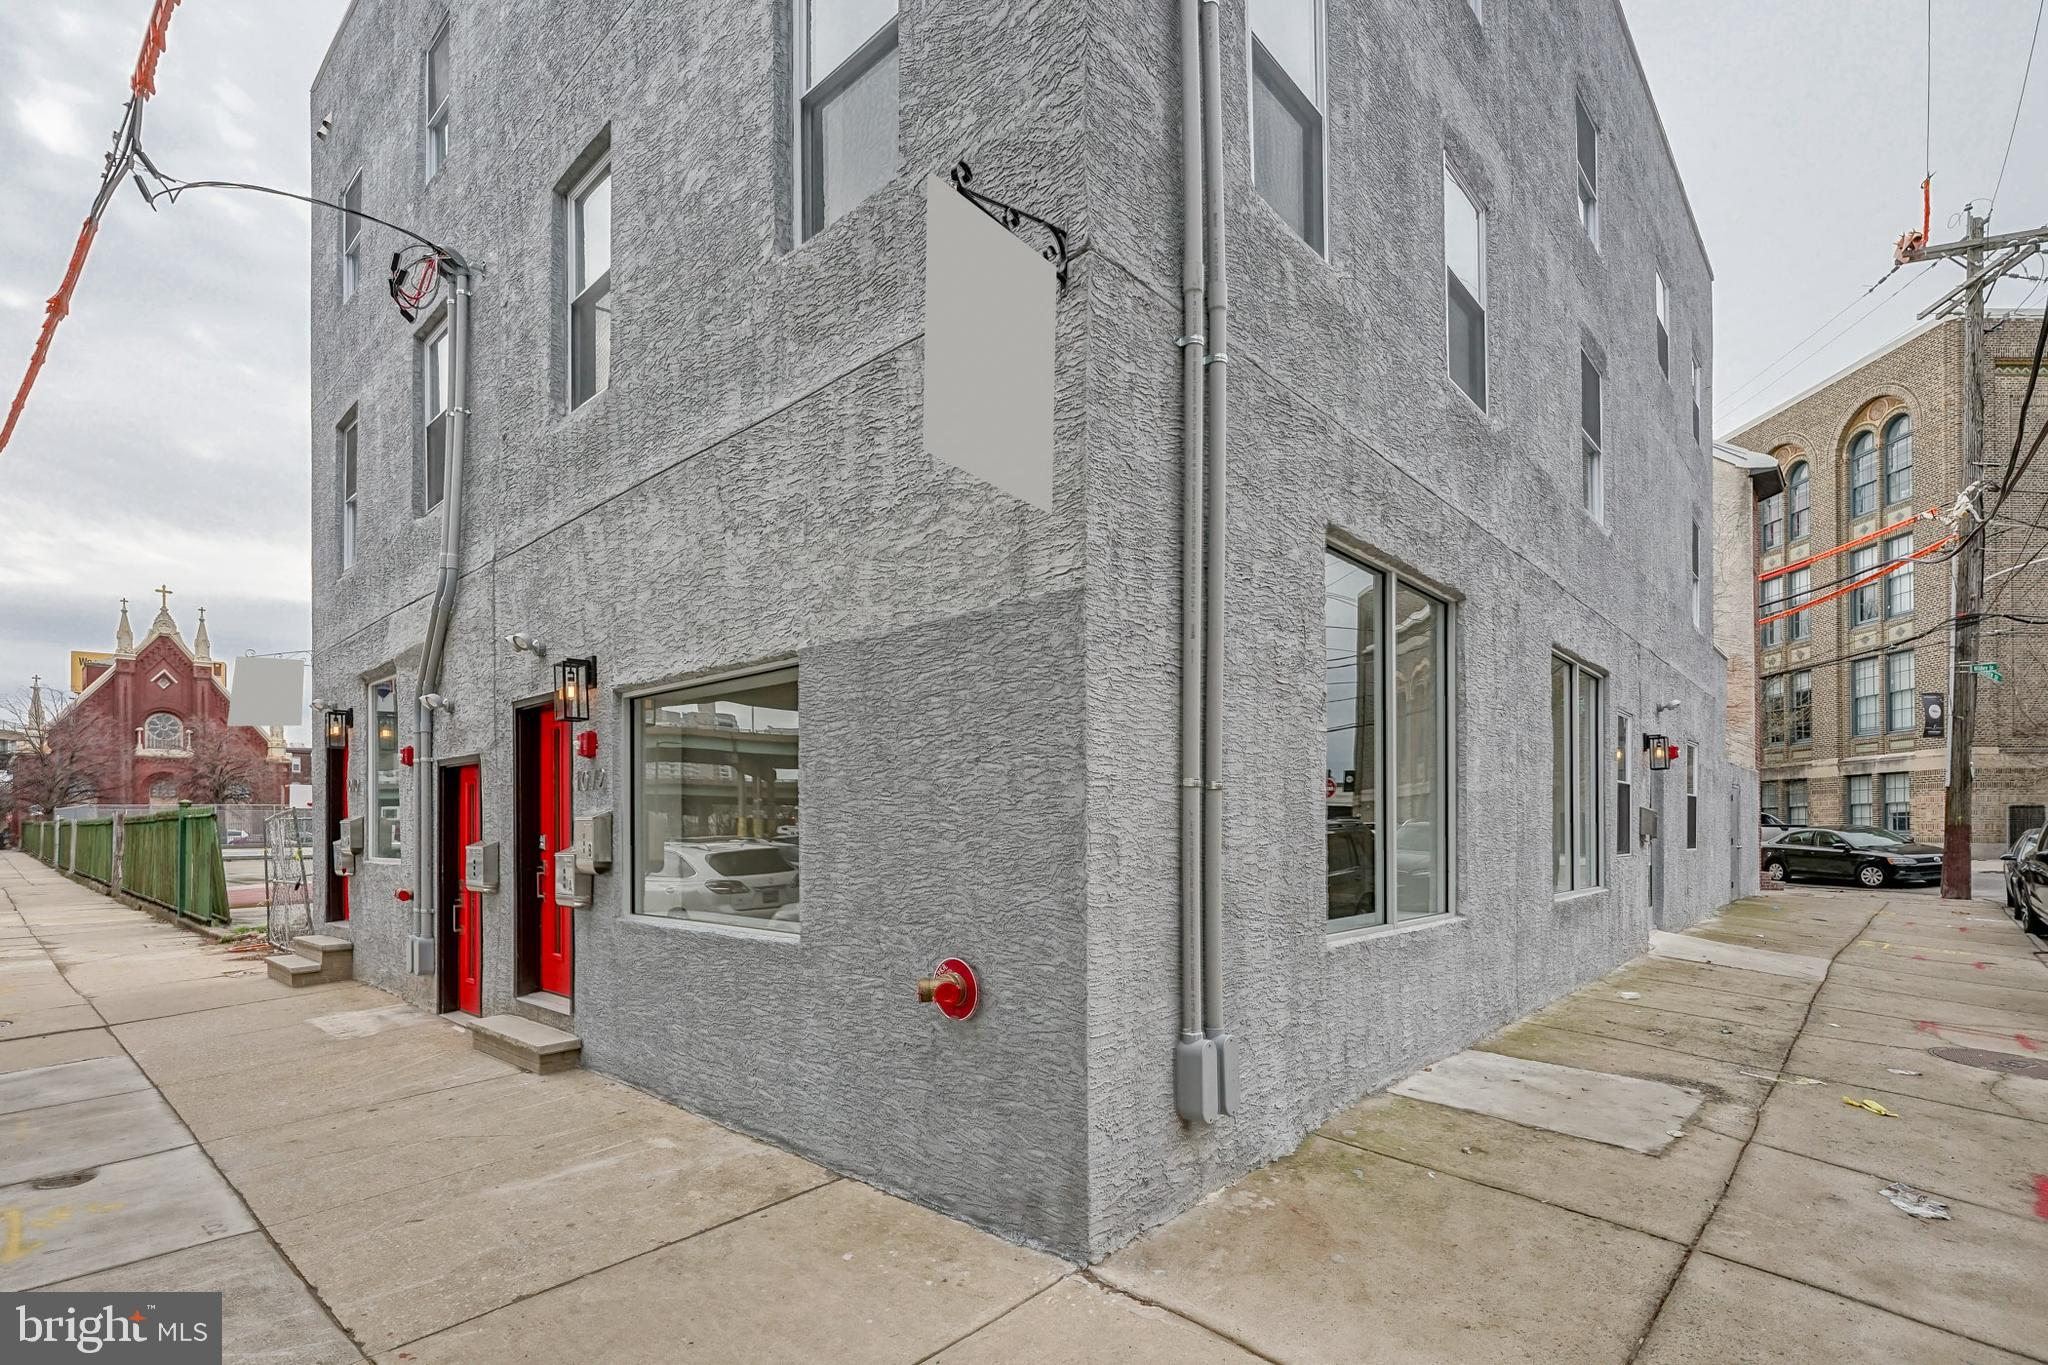 1072 N Front St, Philadelphia, PA, 19123